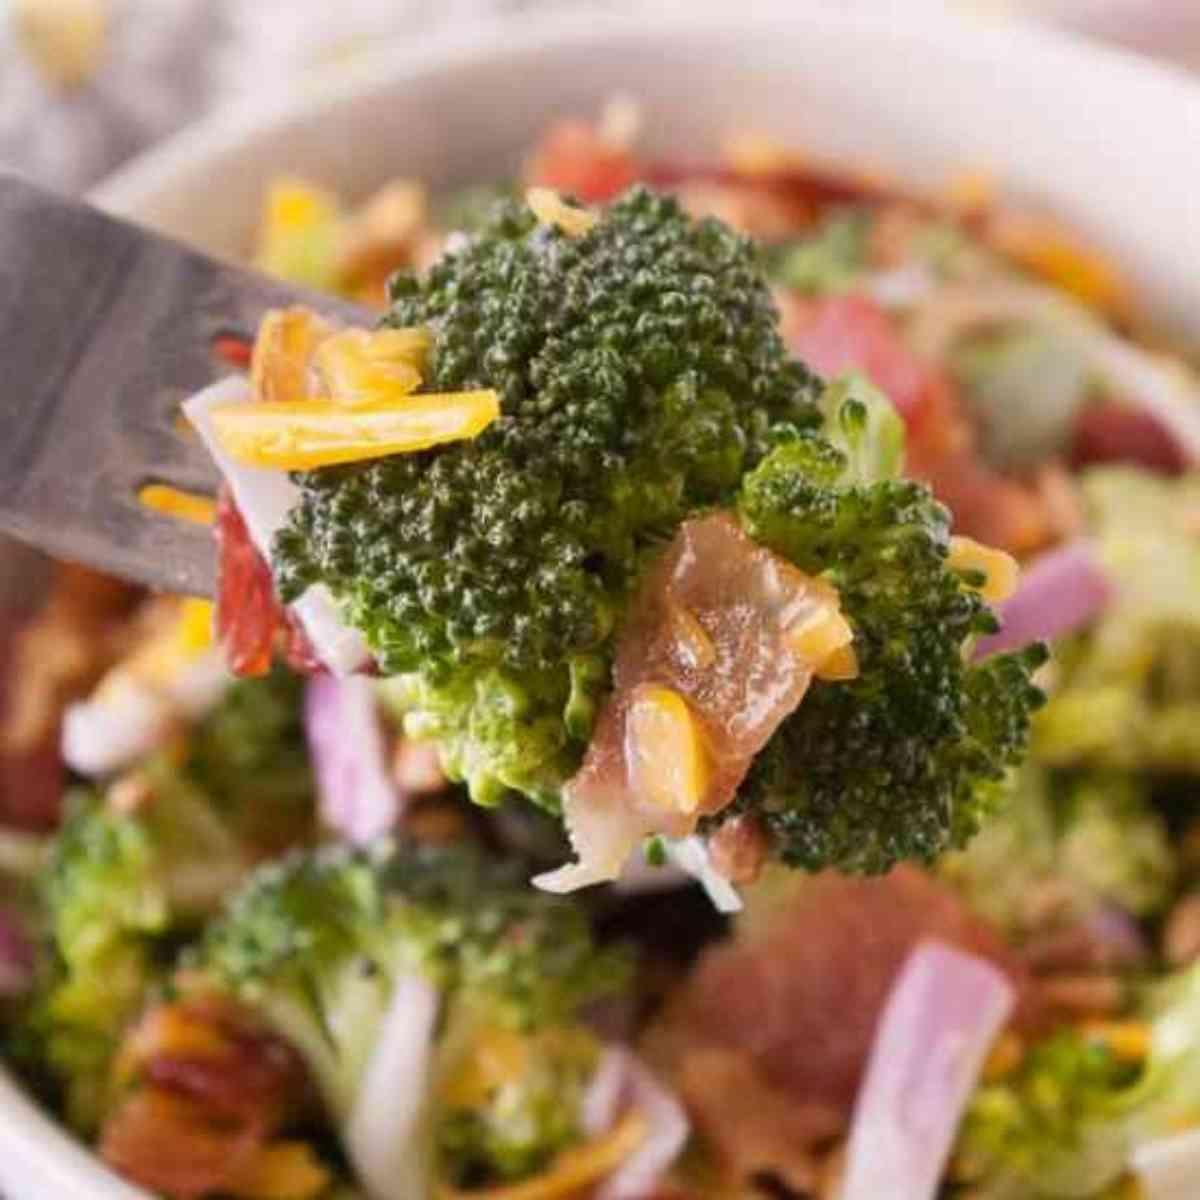 Forkful of broccoli salad